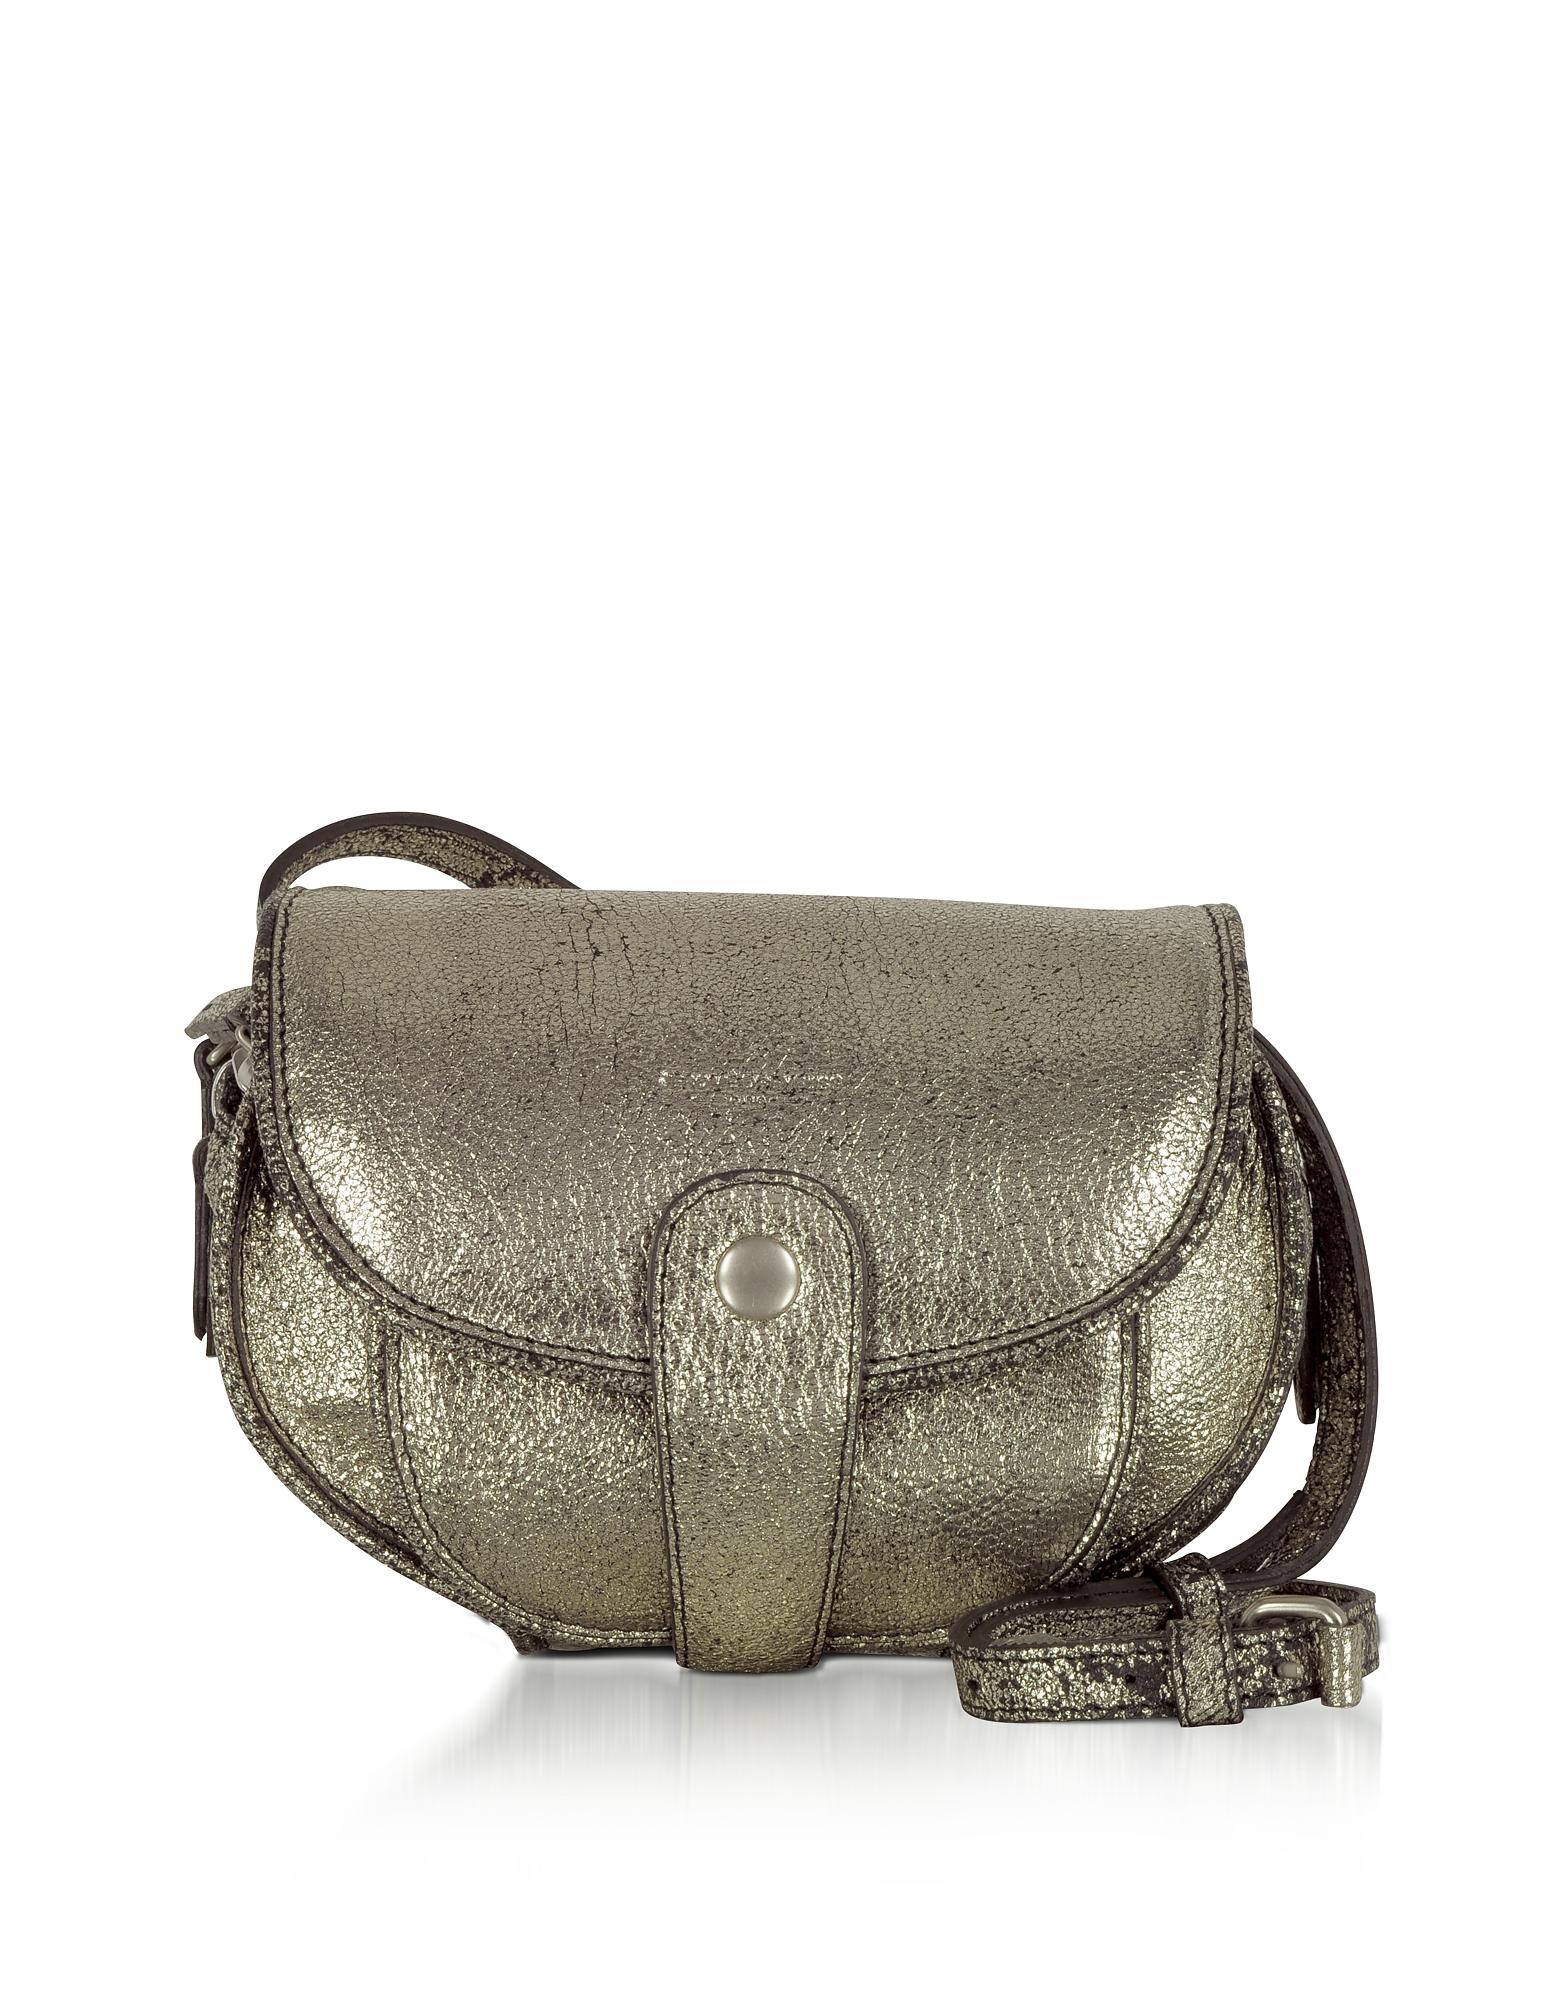 Jerome Dreyfuss Handbags, Momo Laminated Leather Mini Shoulder Bag